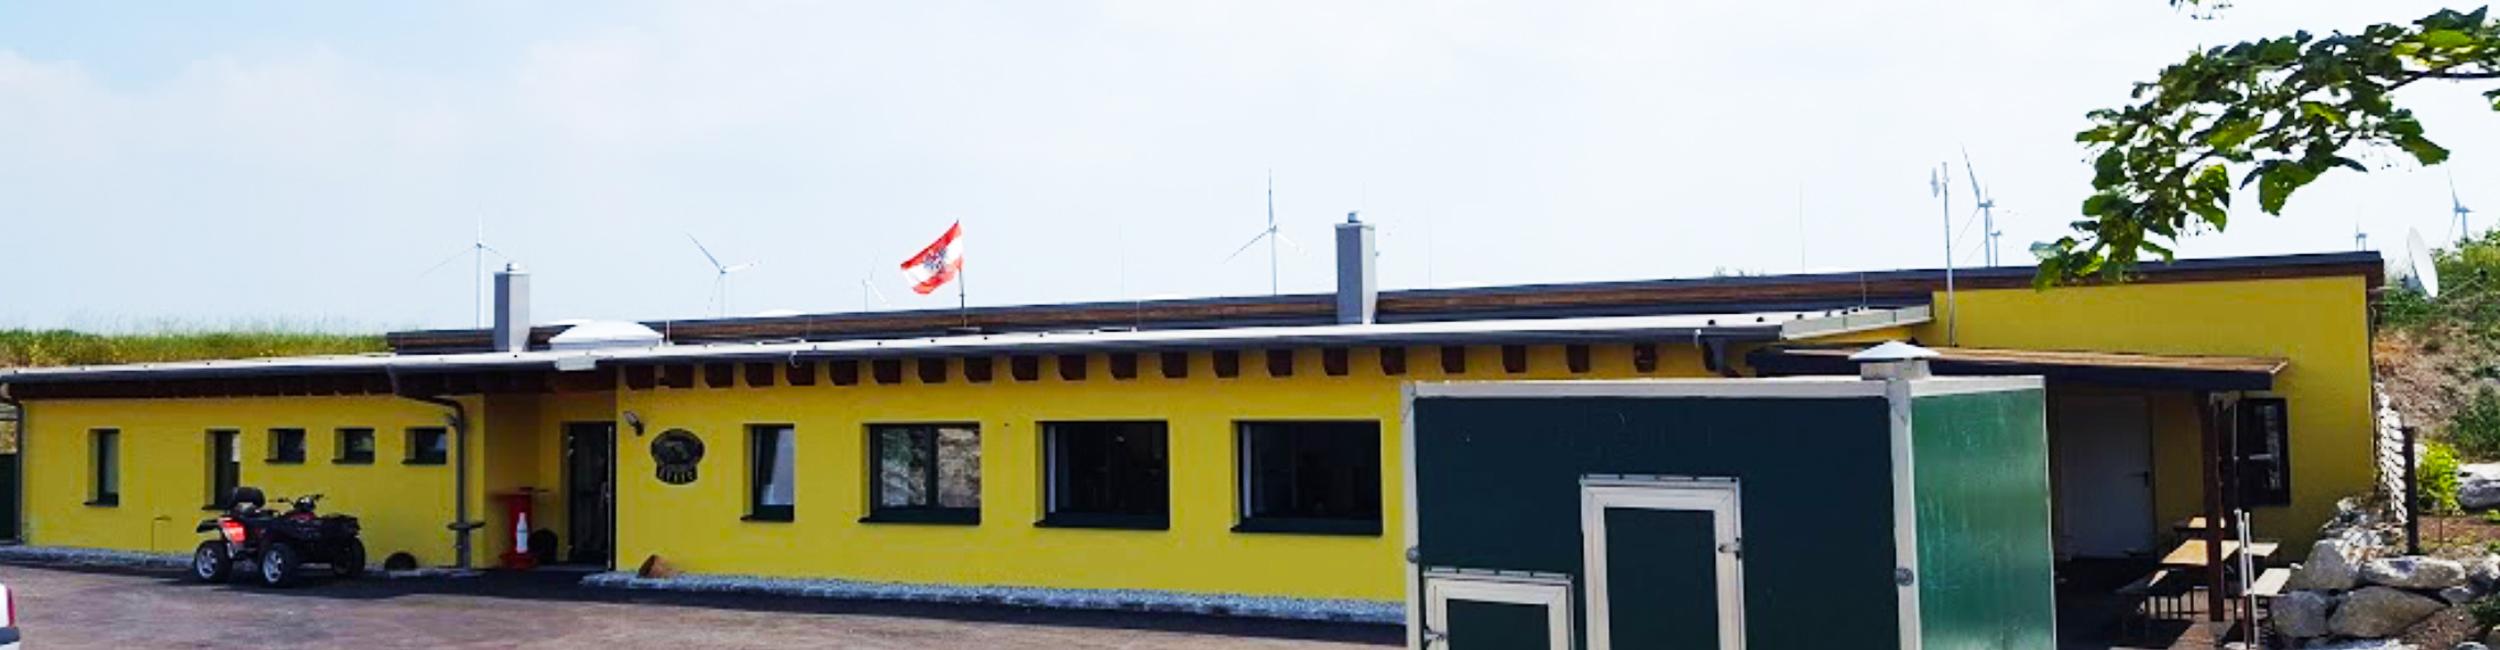 Schießplatzweg 2, A-2523 Tattendorf